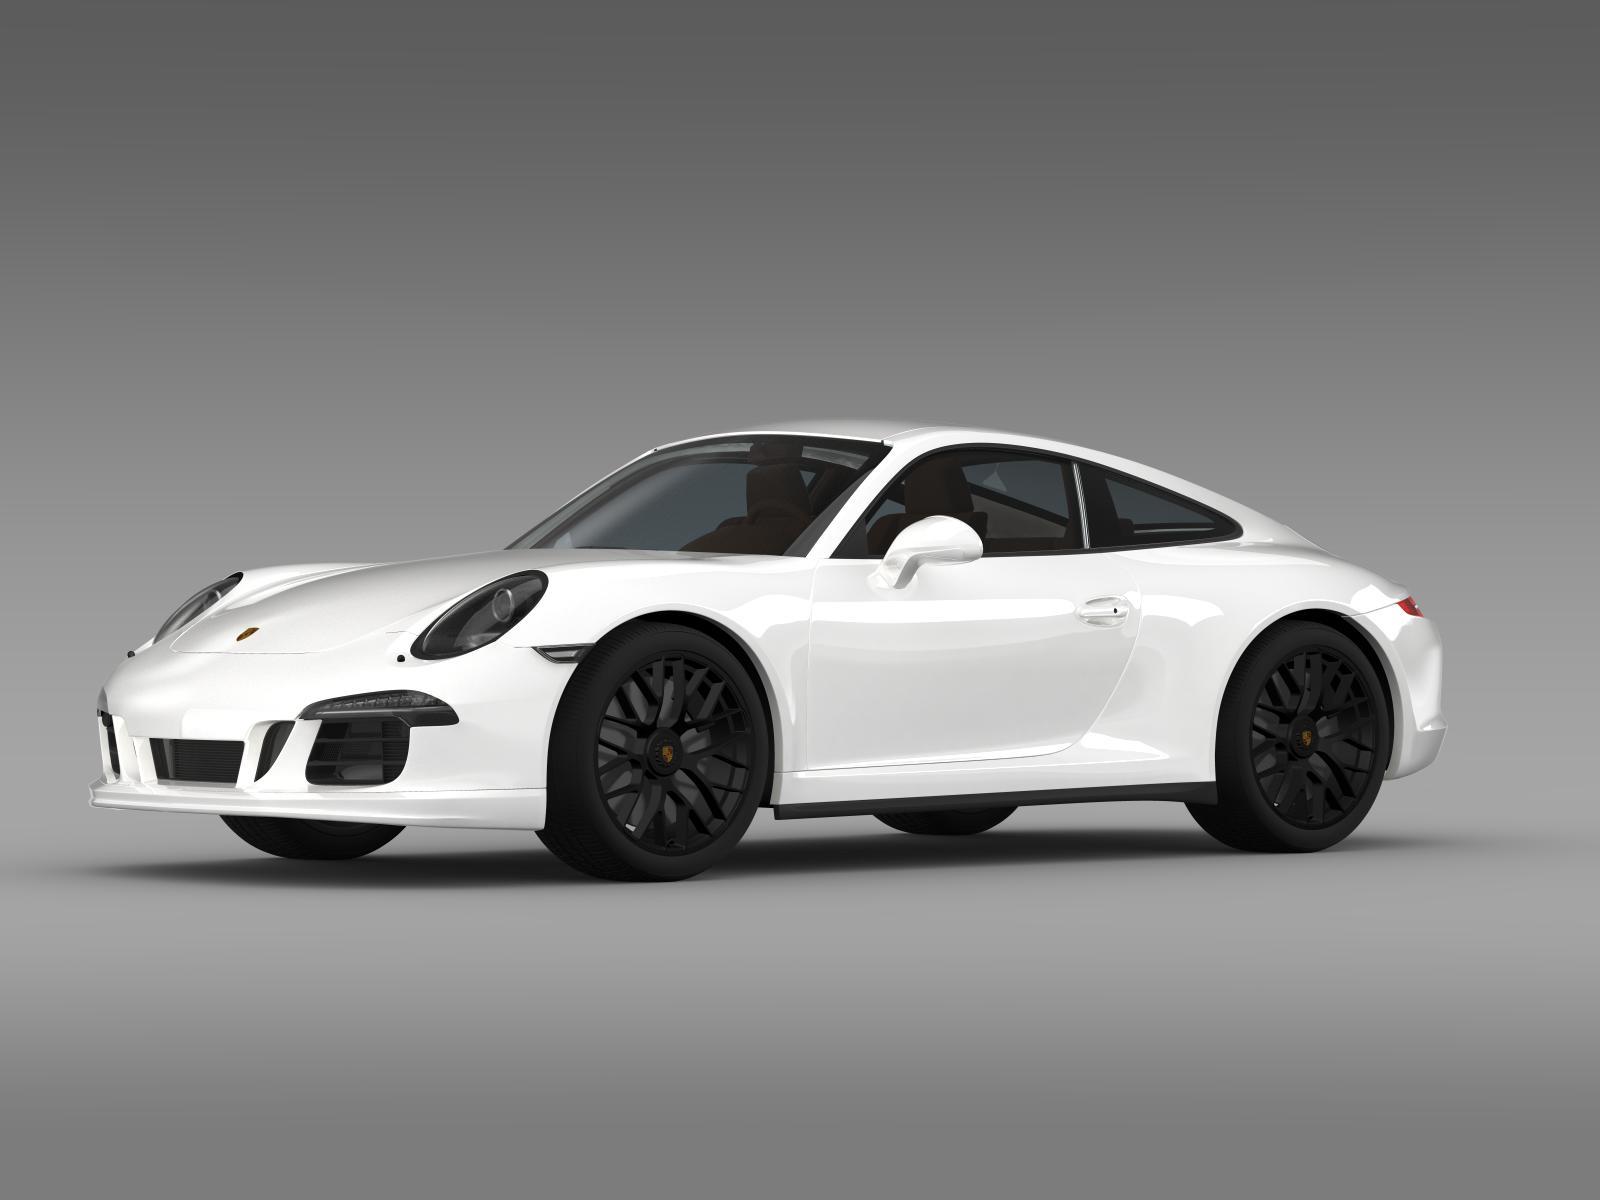 porsche 911 carrera 4 gts coupe 991 2015 3d model buy porsche 911 carrera 4 gts coupe 991 2015. Black Bedroom Furniture Sets. Home Design Ideas